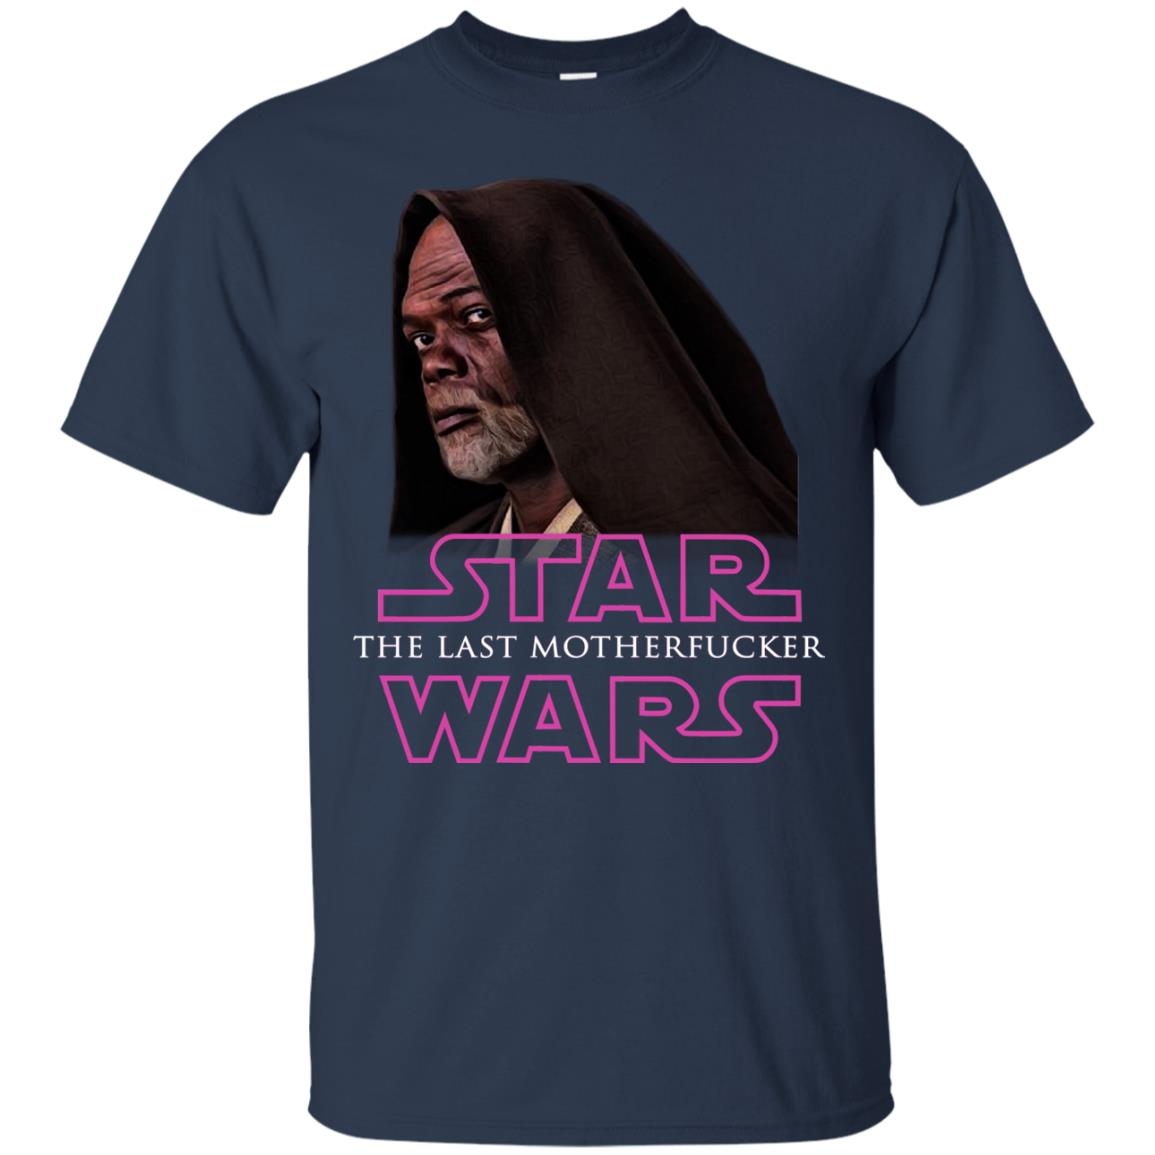 image 762 - Star The Last Motherfucker Wars Shirt, Sweatshirt, Hoodie